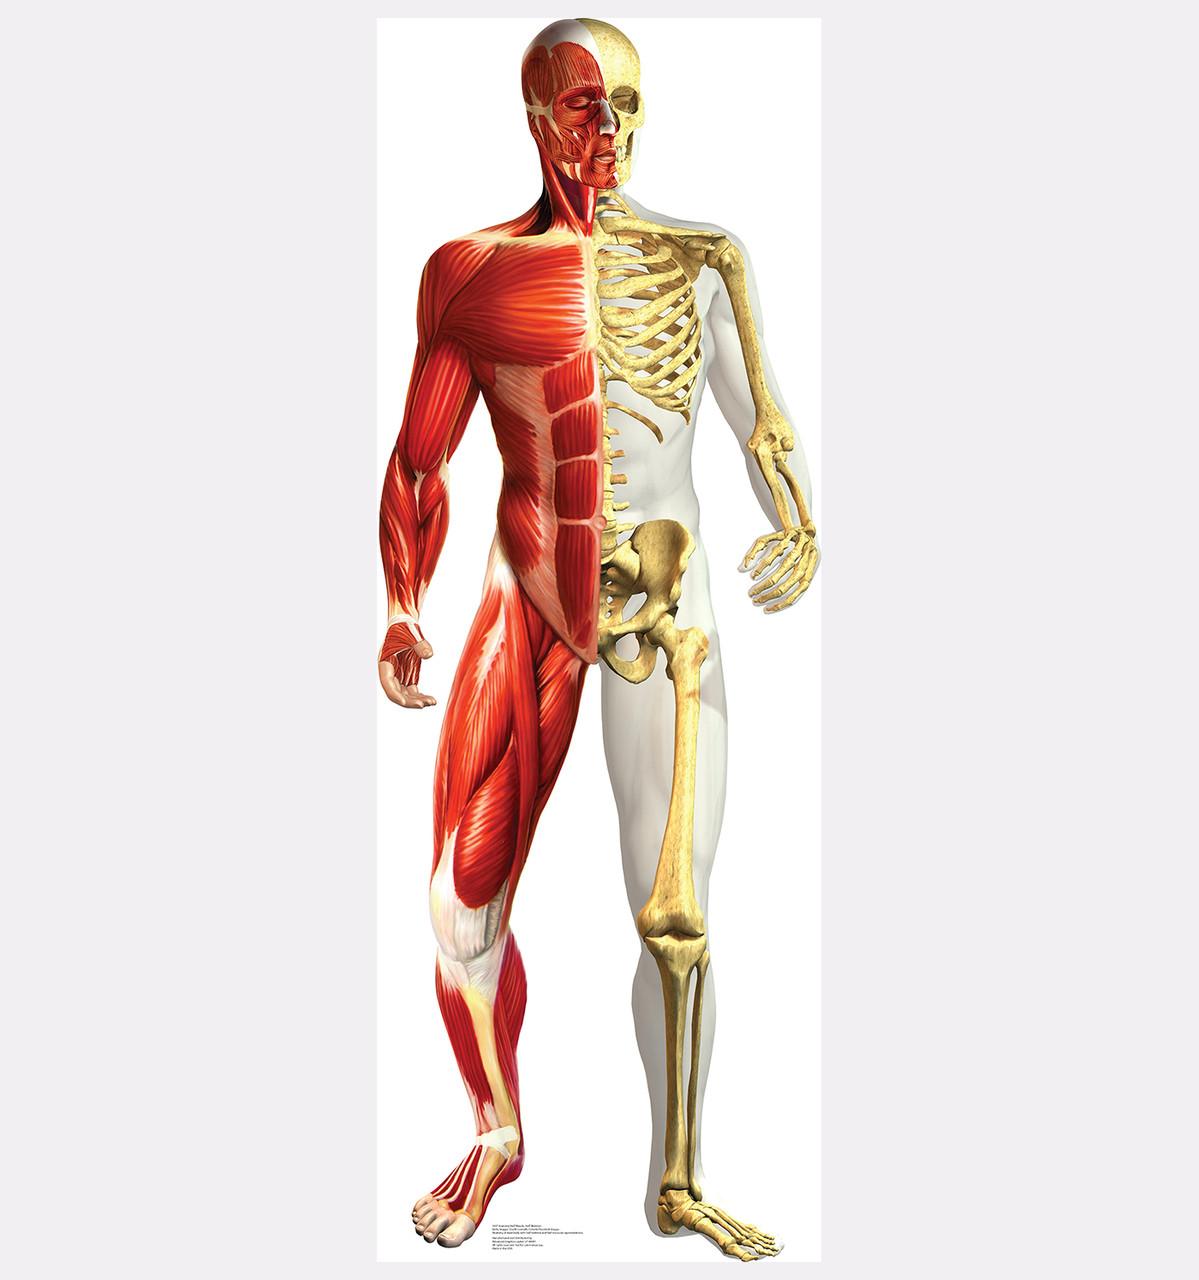 Anatomy - Half Muscle Half Skeleton - Cardboard Cutout Front View